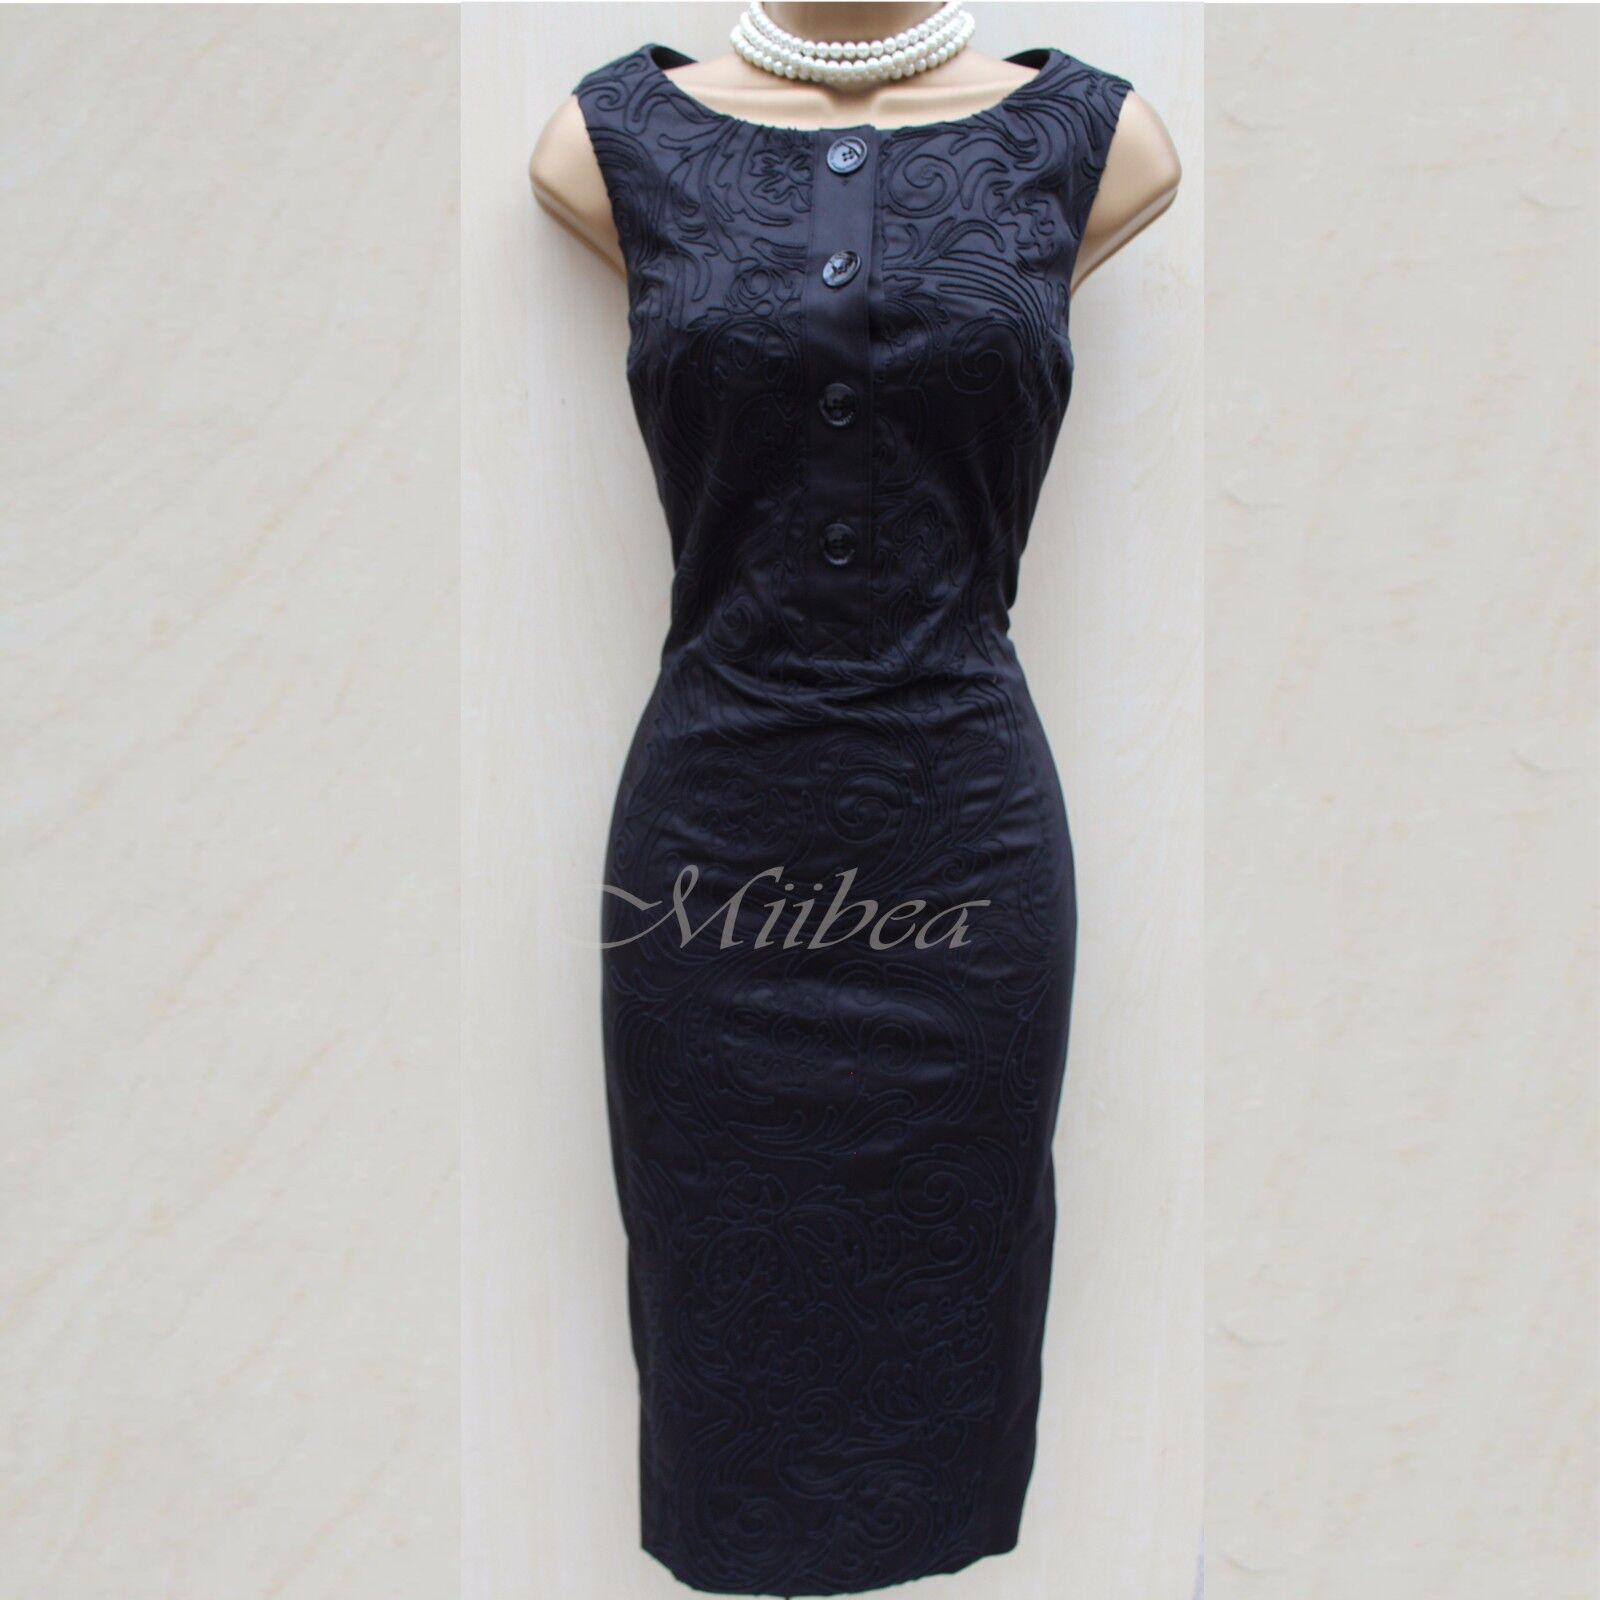 Karen Millen schwarz Cotton Embroiderot Cut Work Cocktail Party Wiggle Dress 16 UK